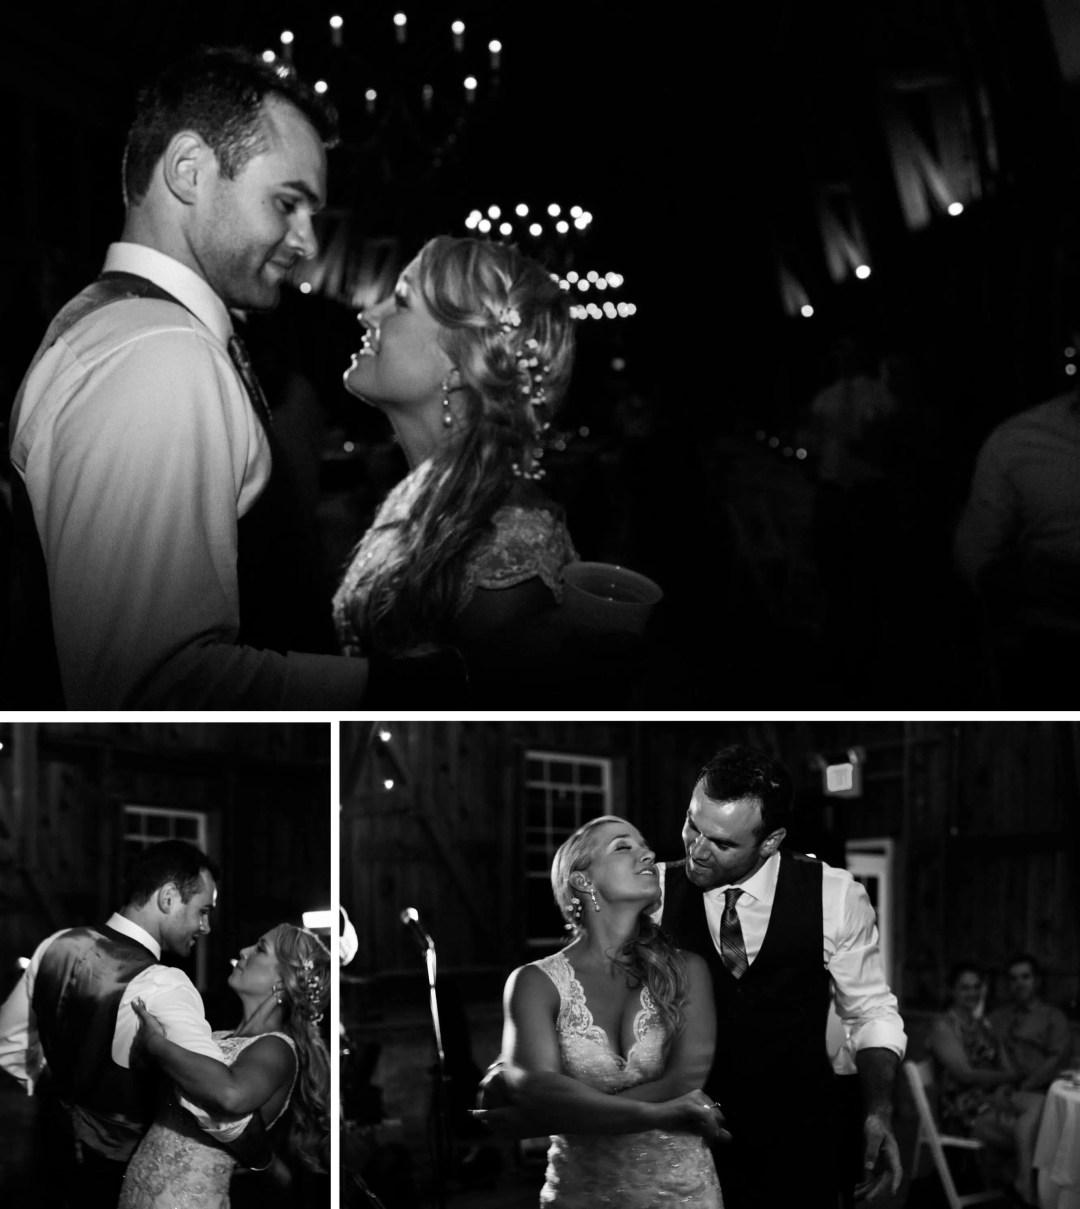 West Sussex Wedding Photographer - Barn reception first dance